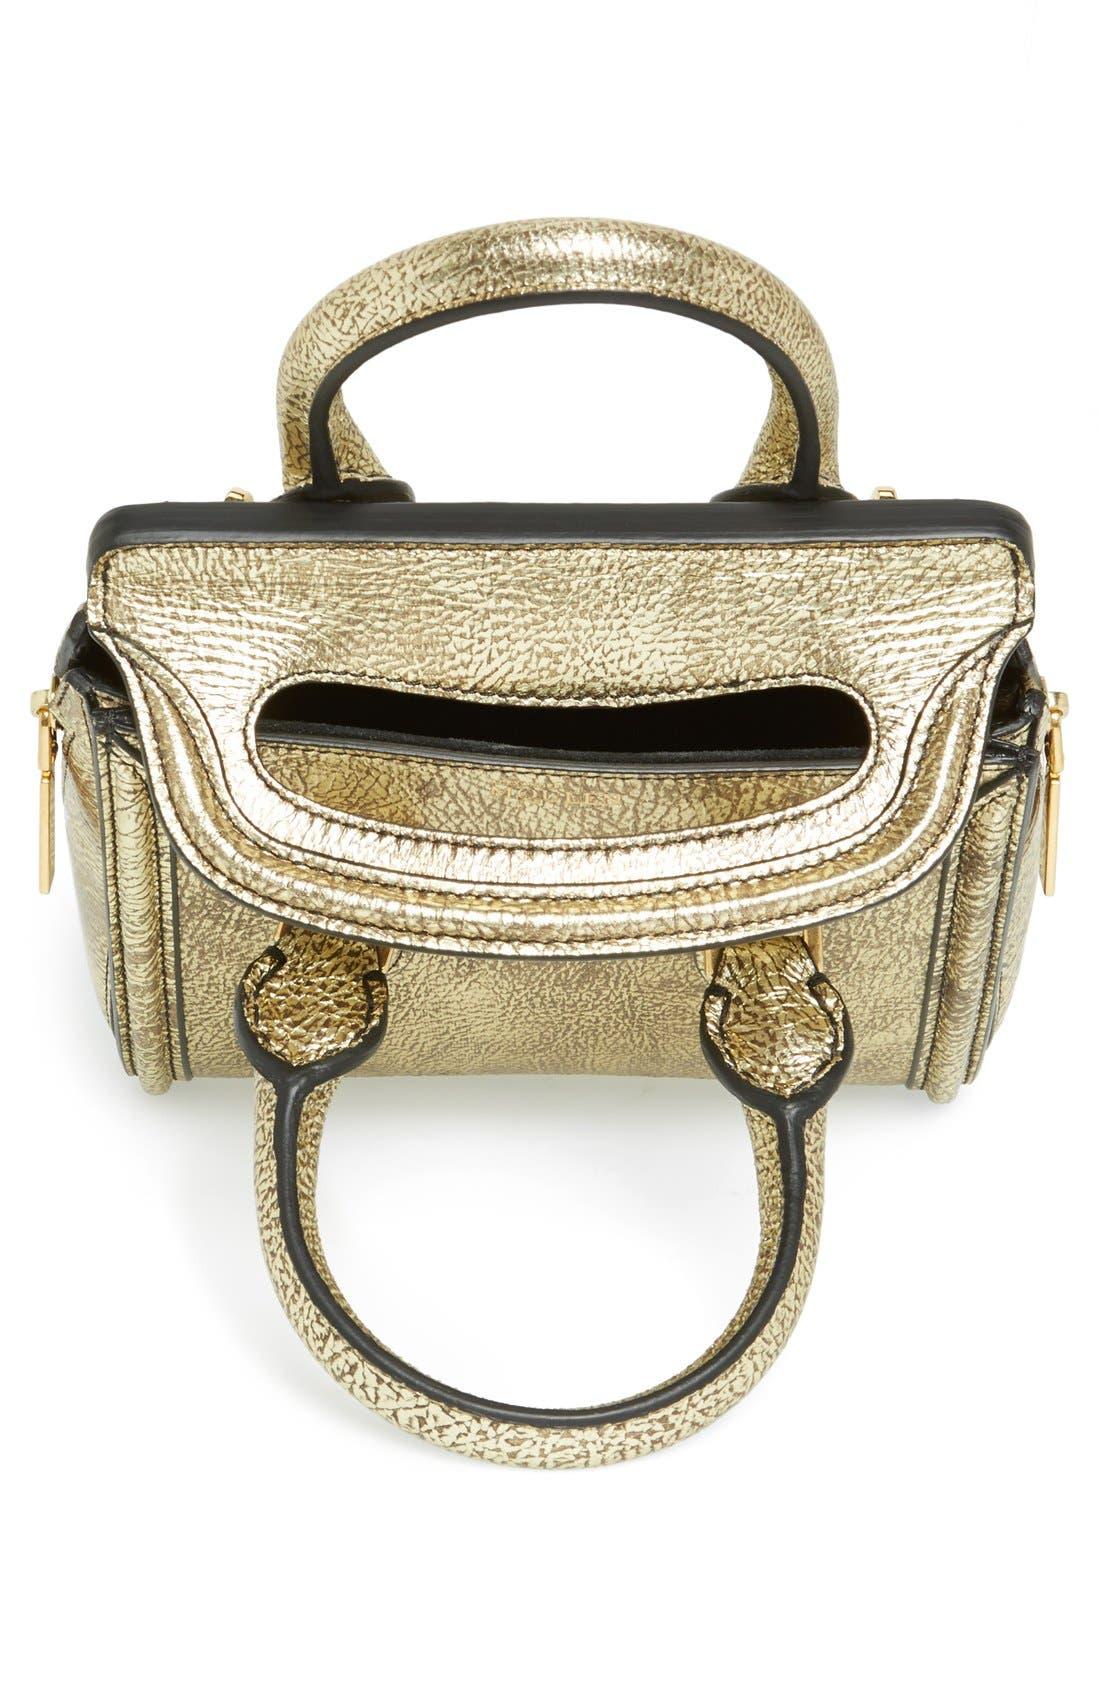 Alternate Image 3  - Alexander McQueen 'Mini Heroine' Metallic Lambskin Leather Crossbody Bag